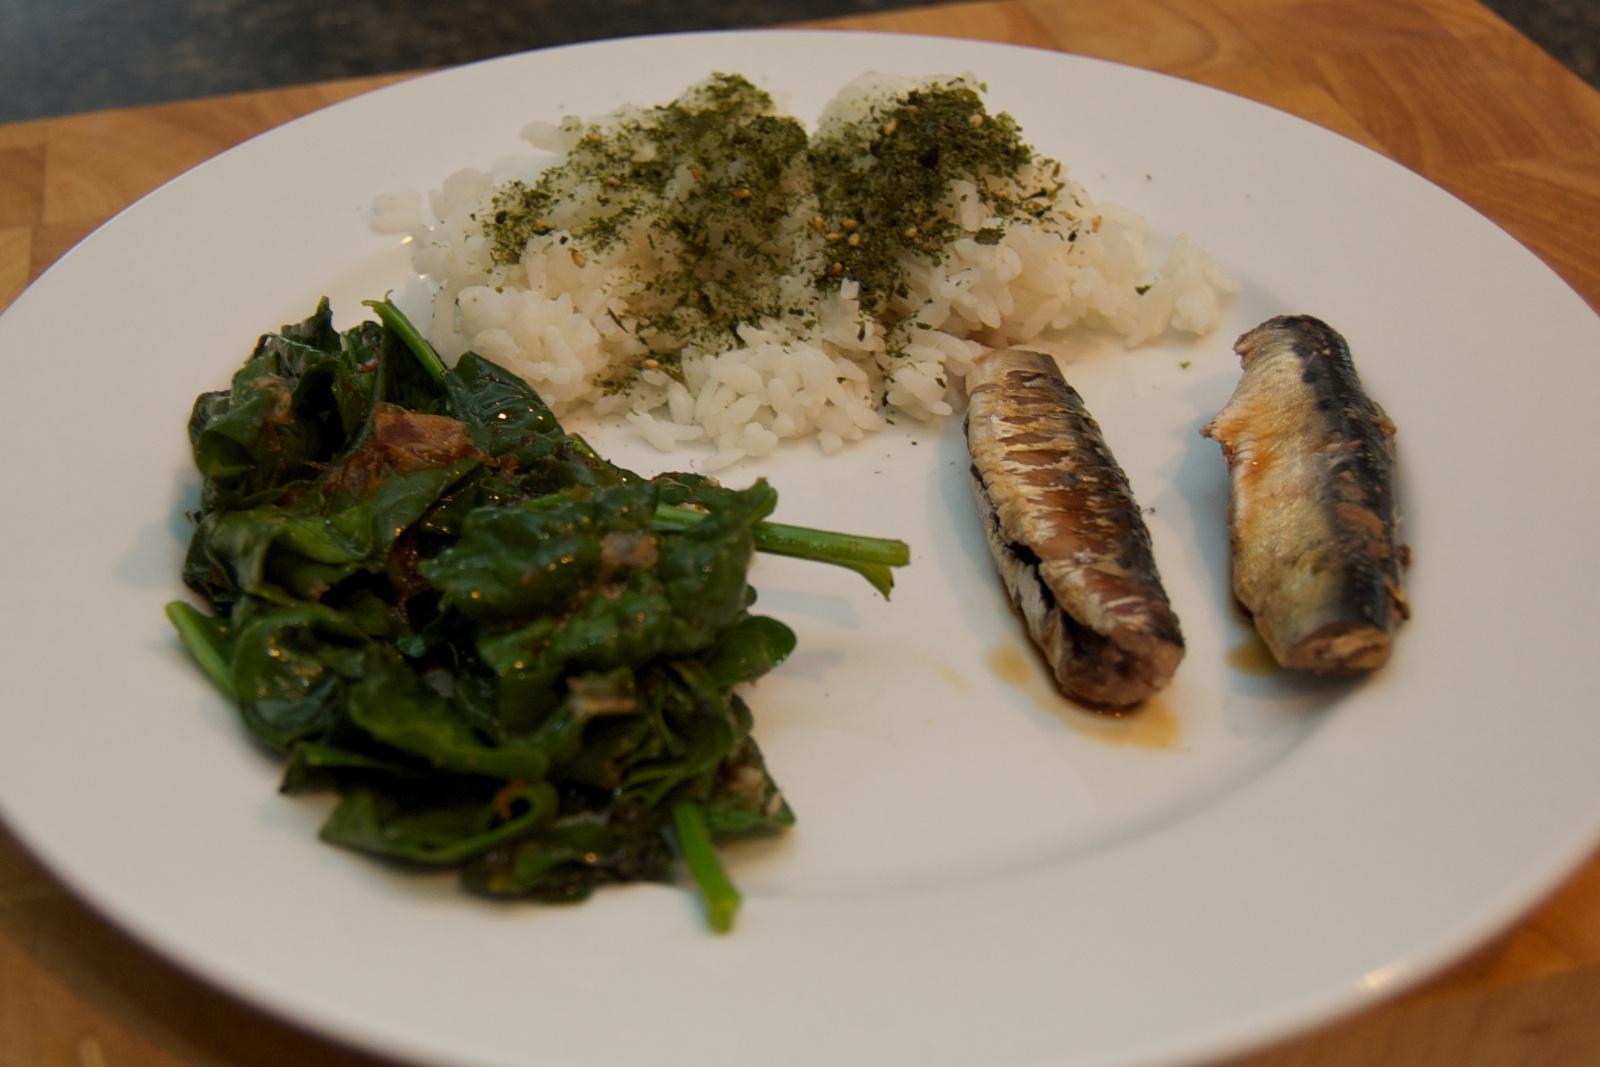 http://blog.rickk.com/food/2010/10/22/ate.20101021.l.jpg